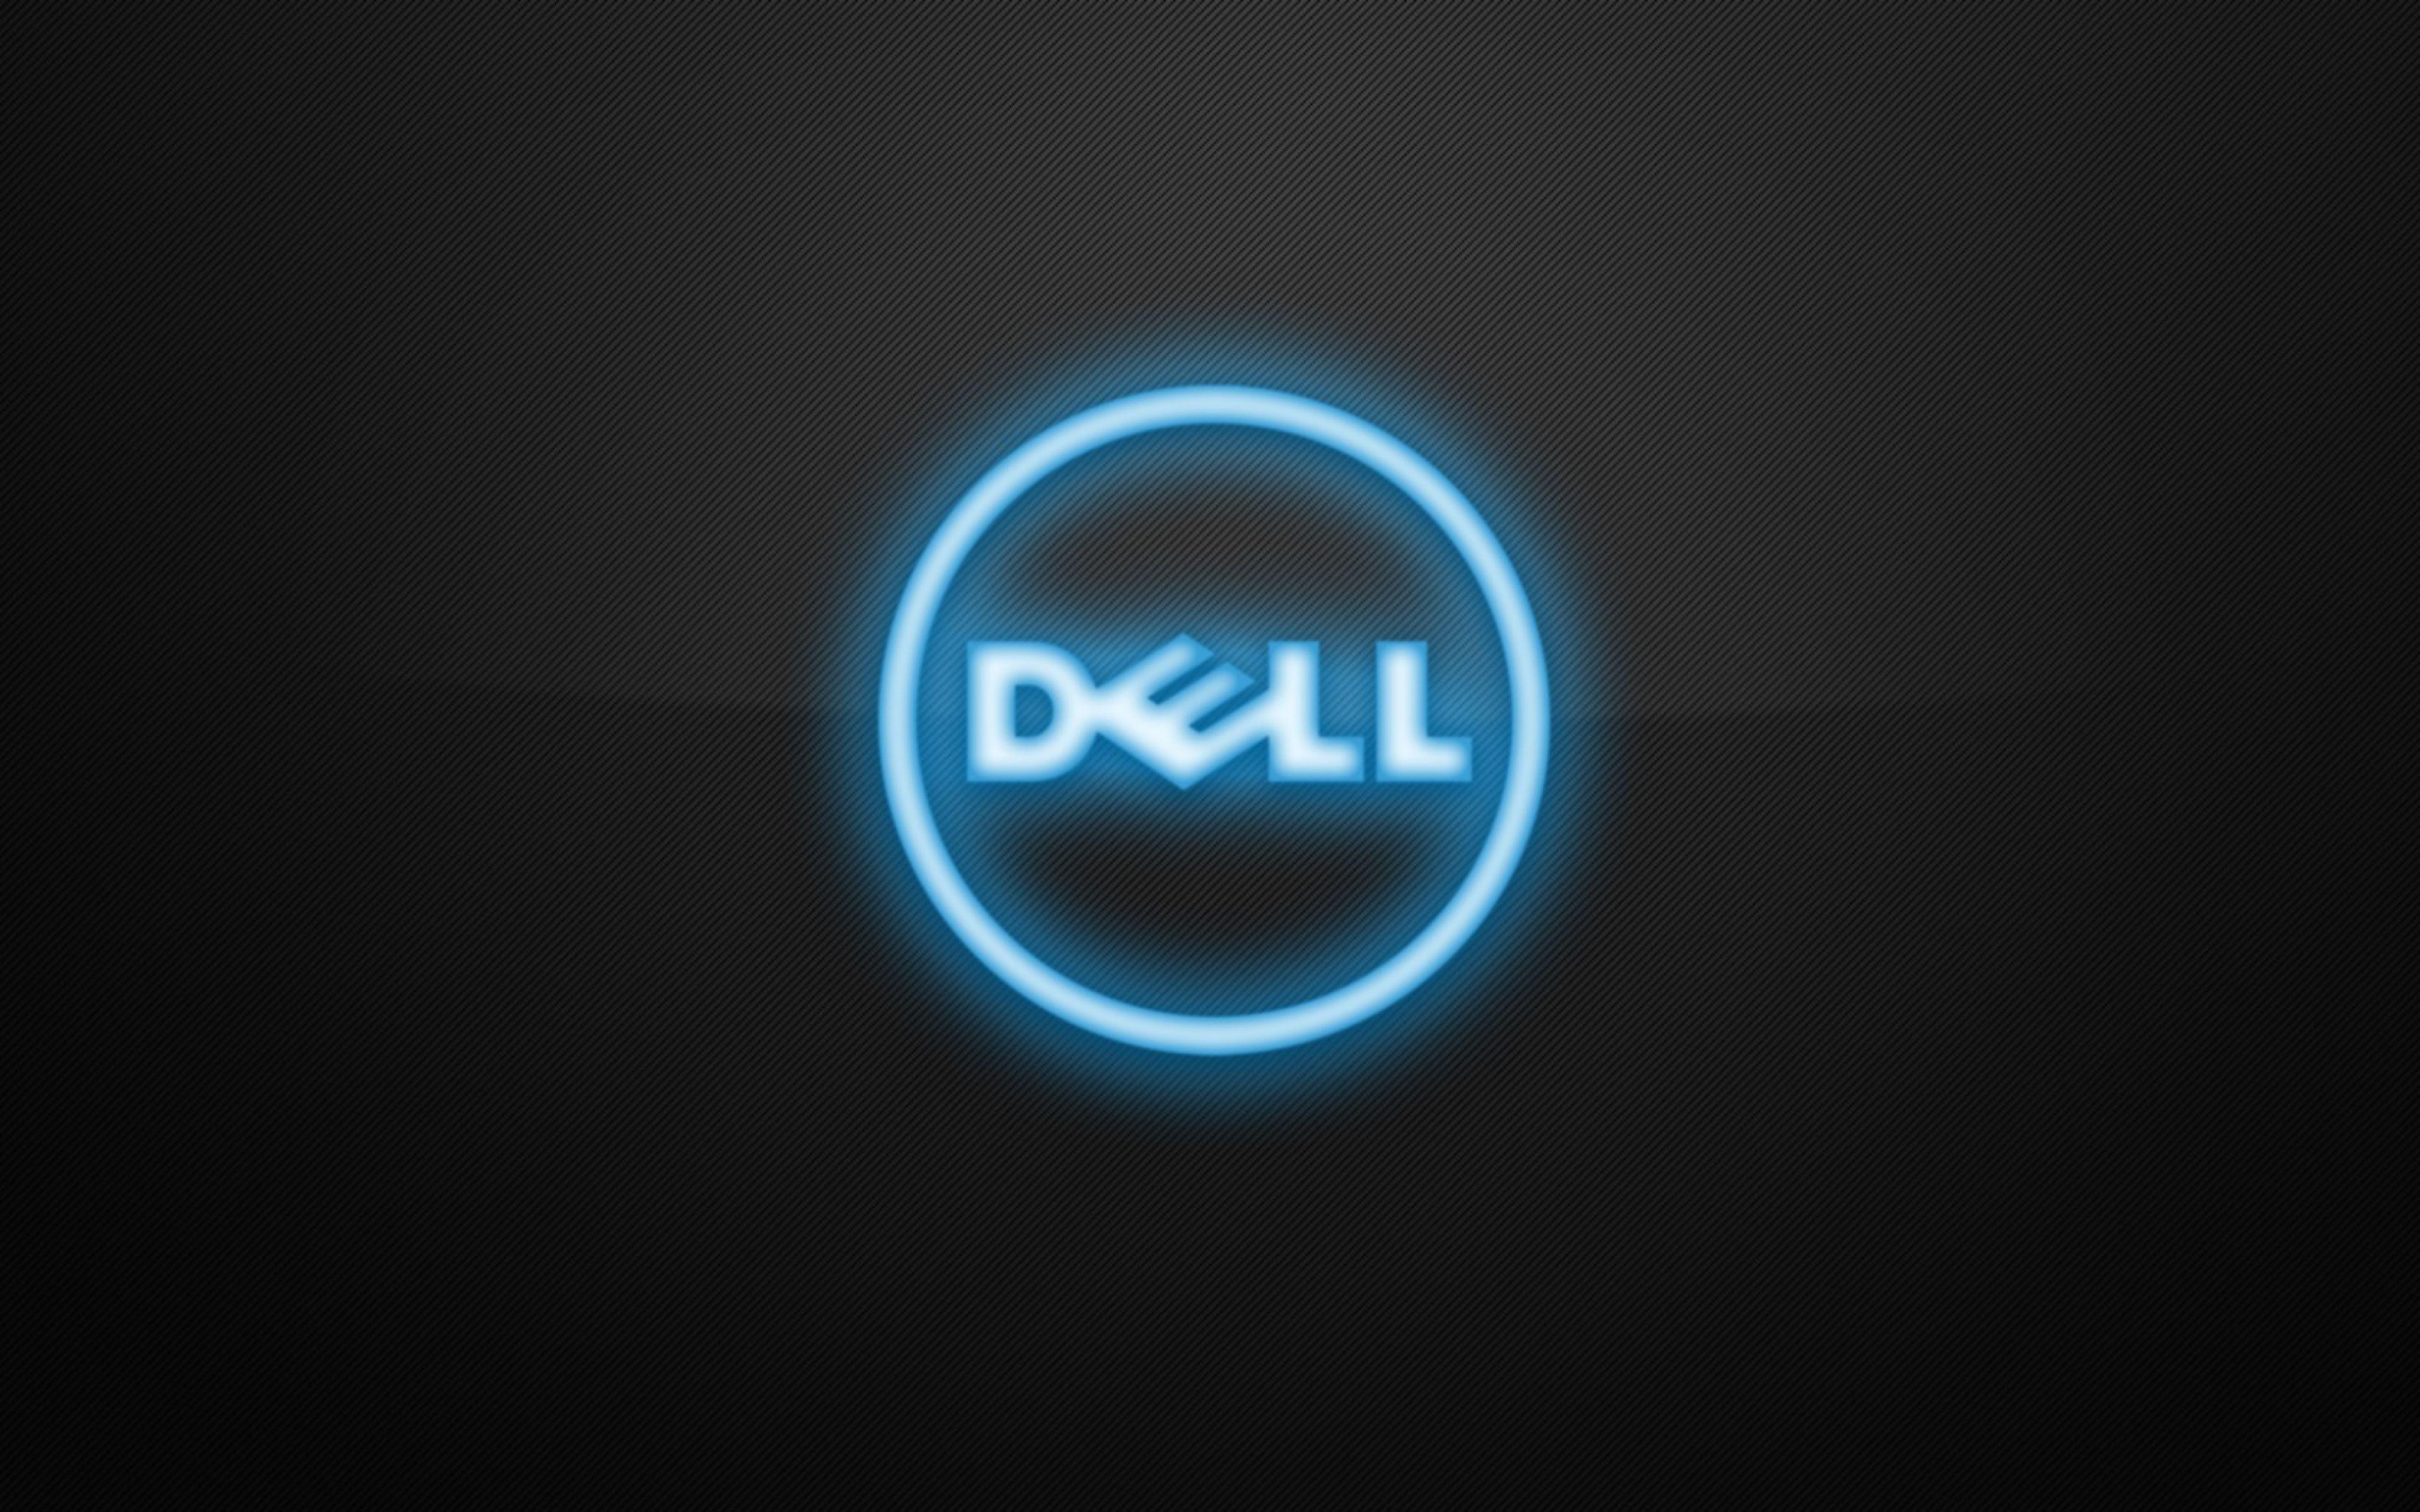 Dell Gamer 4K Wallpapers - Top Free Dell Gamer 4K ...